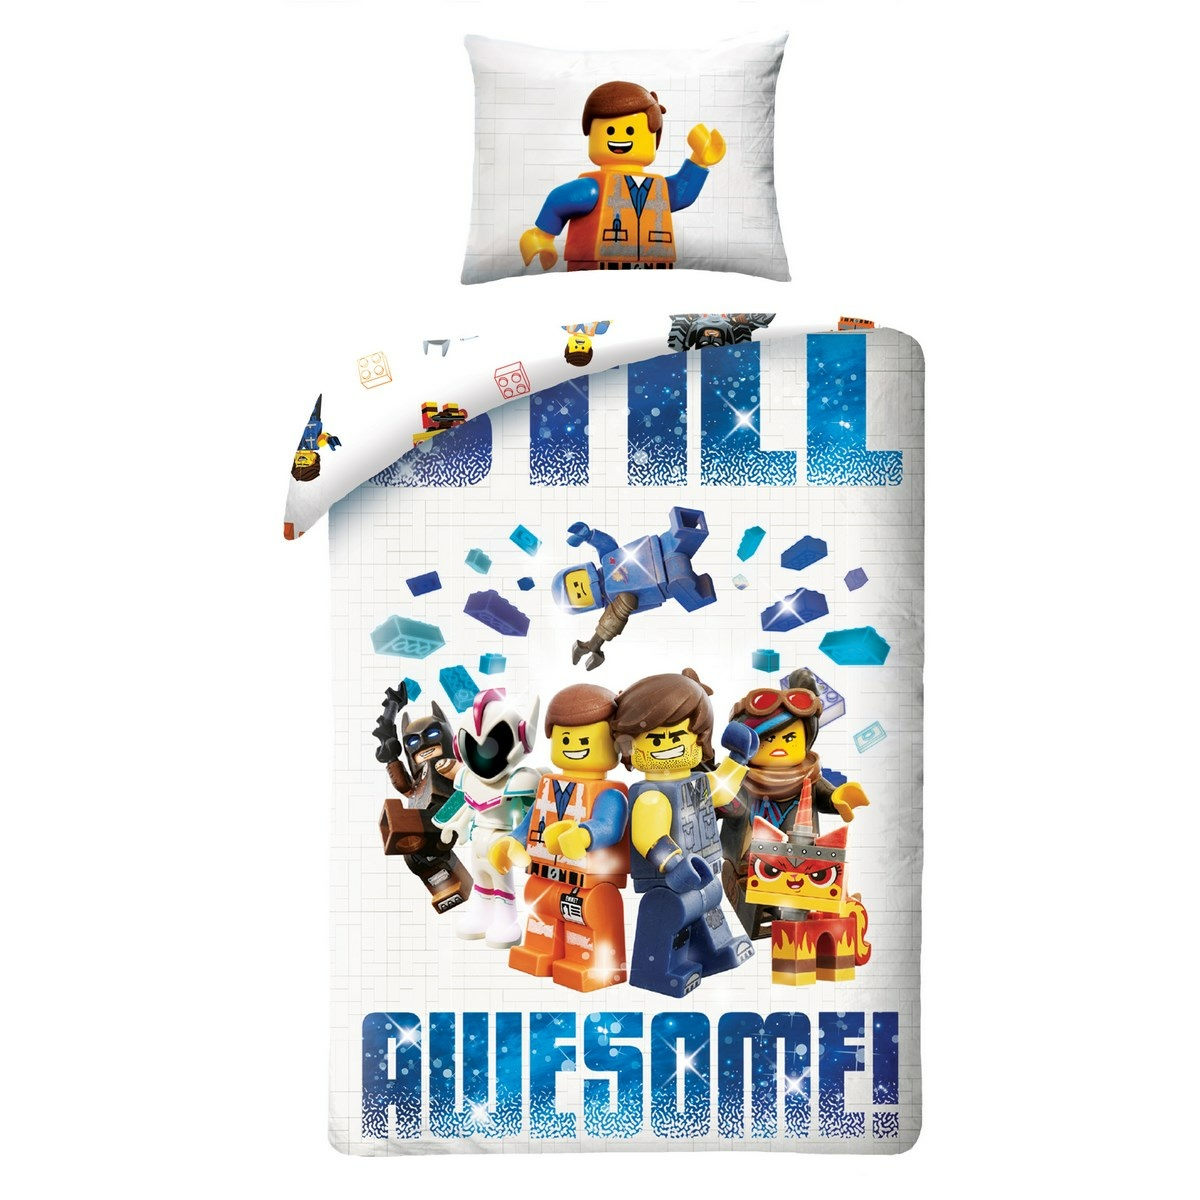 Lenjerie din bumbac, pentru copii Lego Awesome, 140 x 200 cm, 70 x 90 cm imagine 2021 e4home.ro